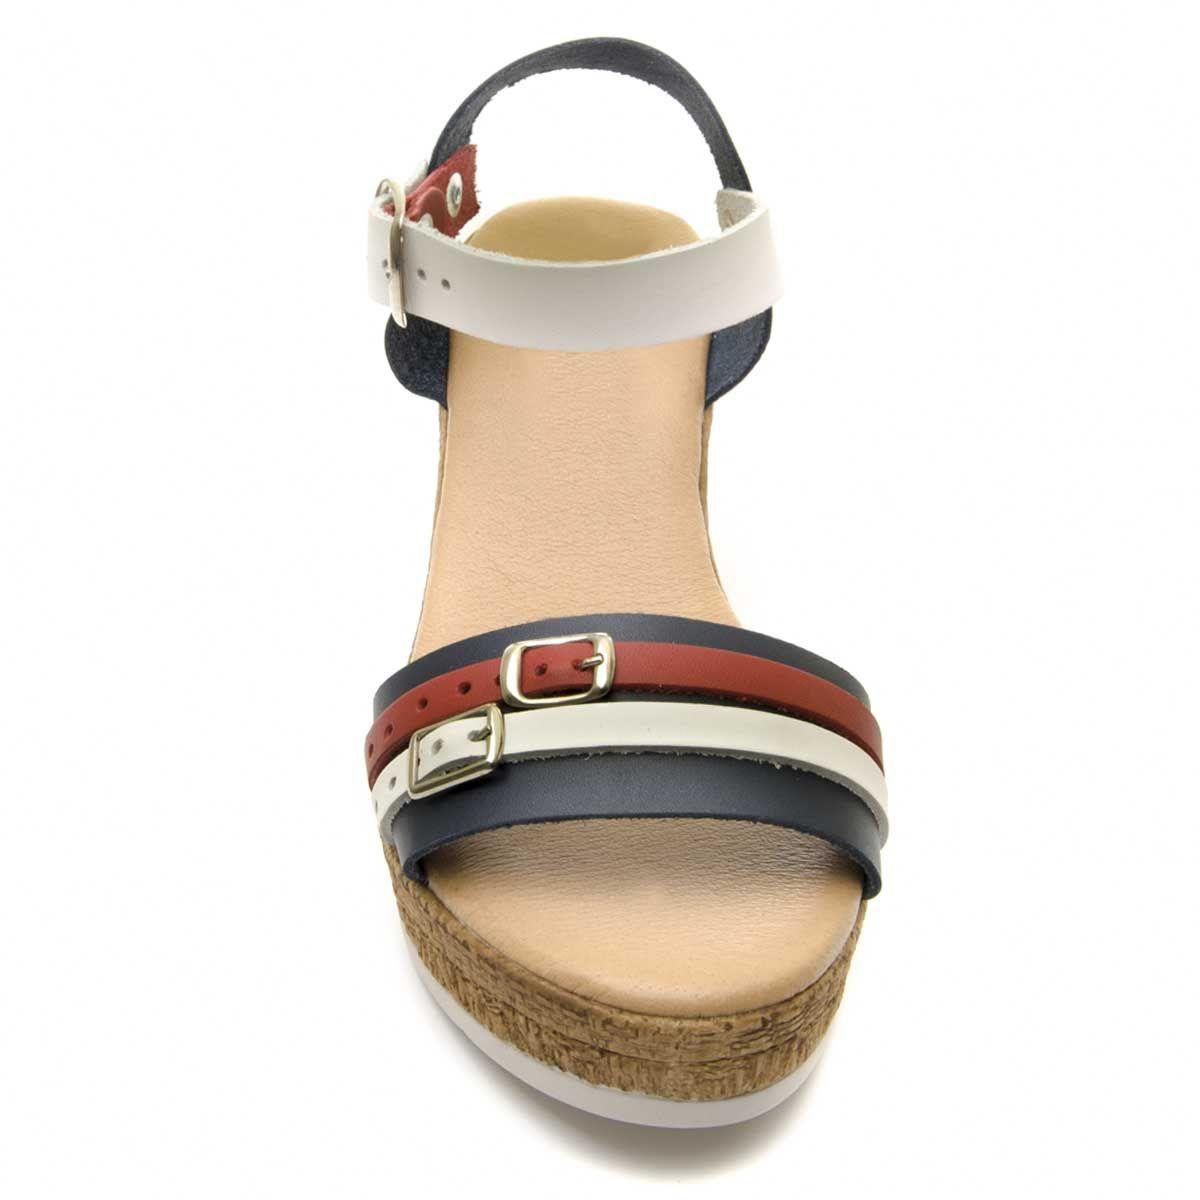 Purapiel Wedge Sandal in Multicolour